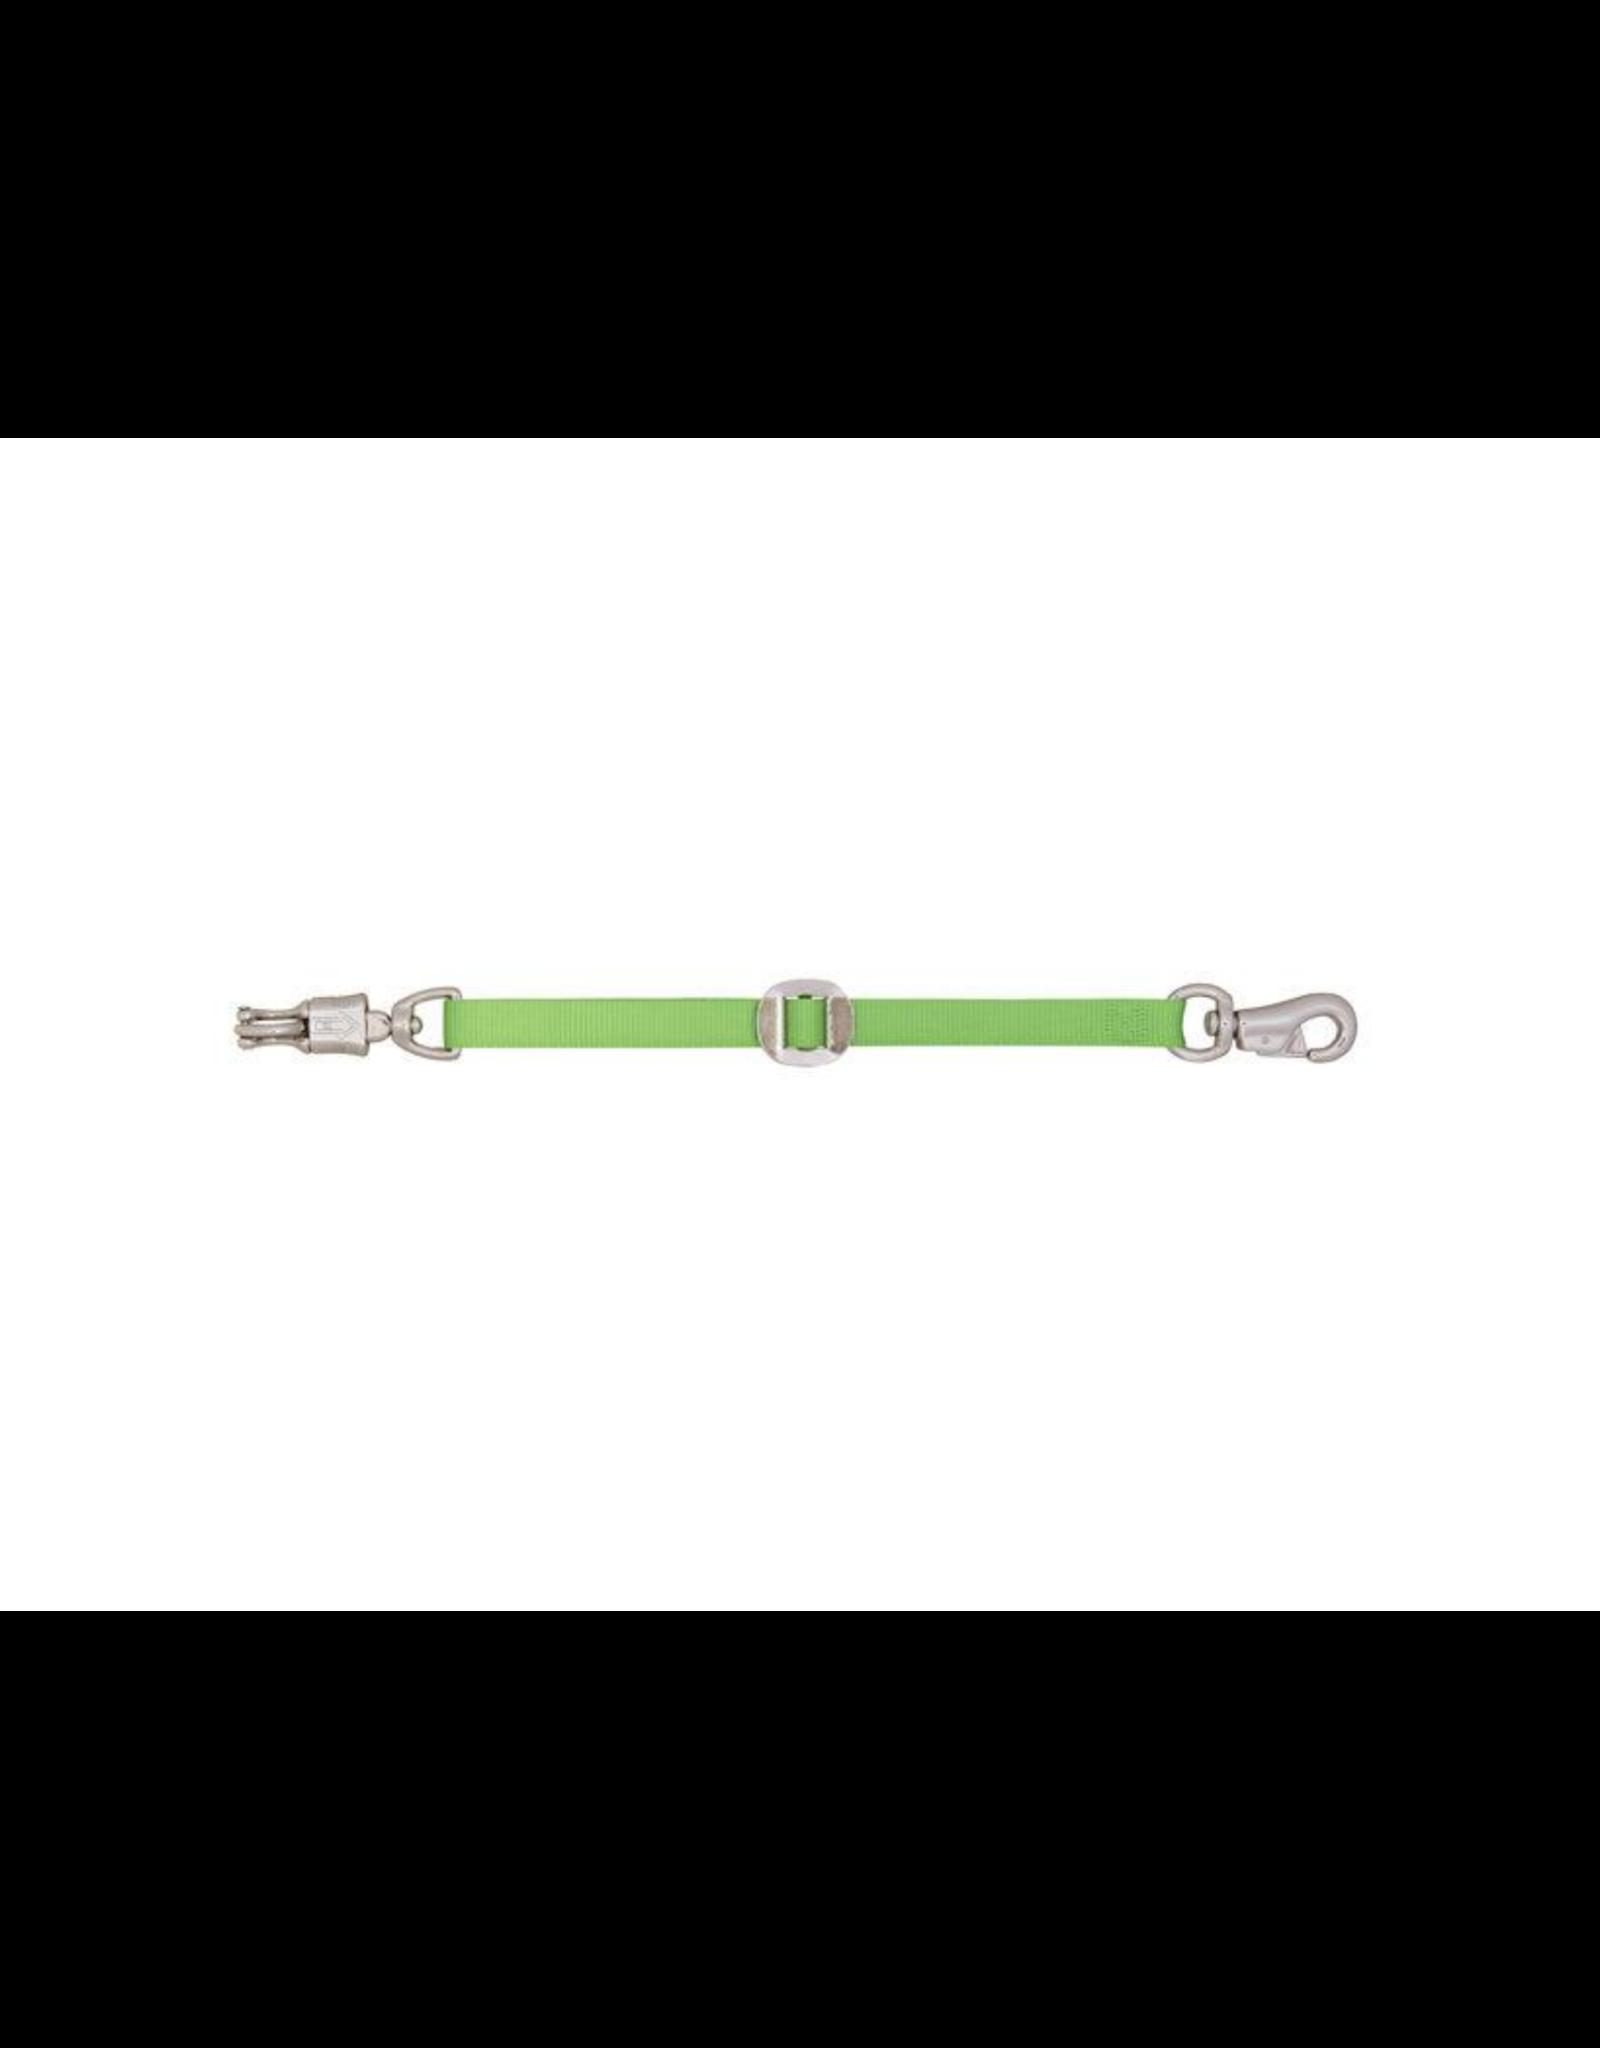 Weaver Nylon Trailer Tie